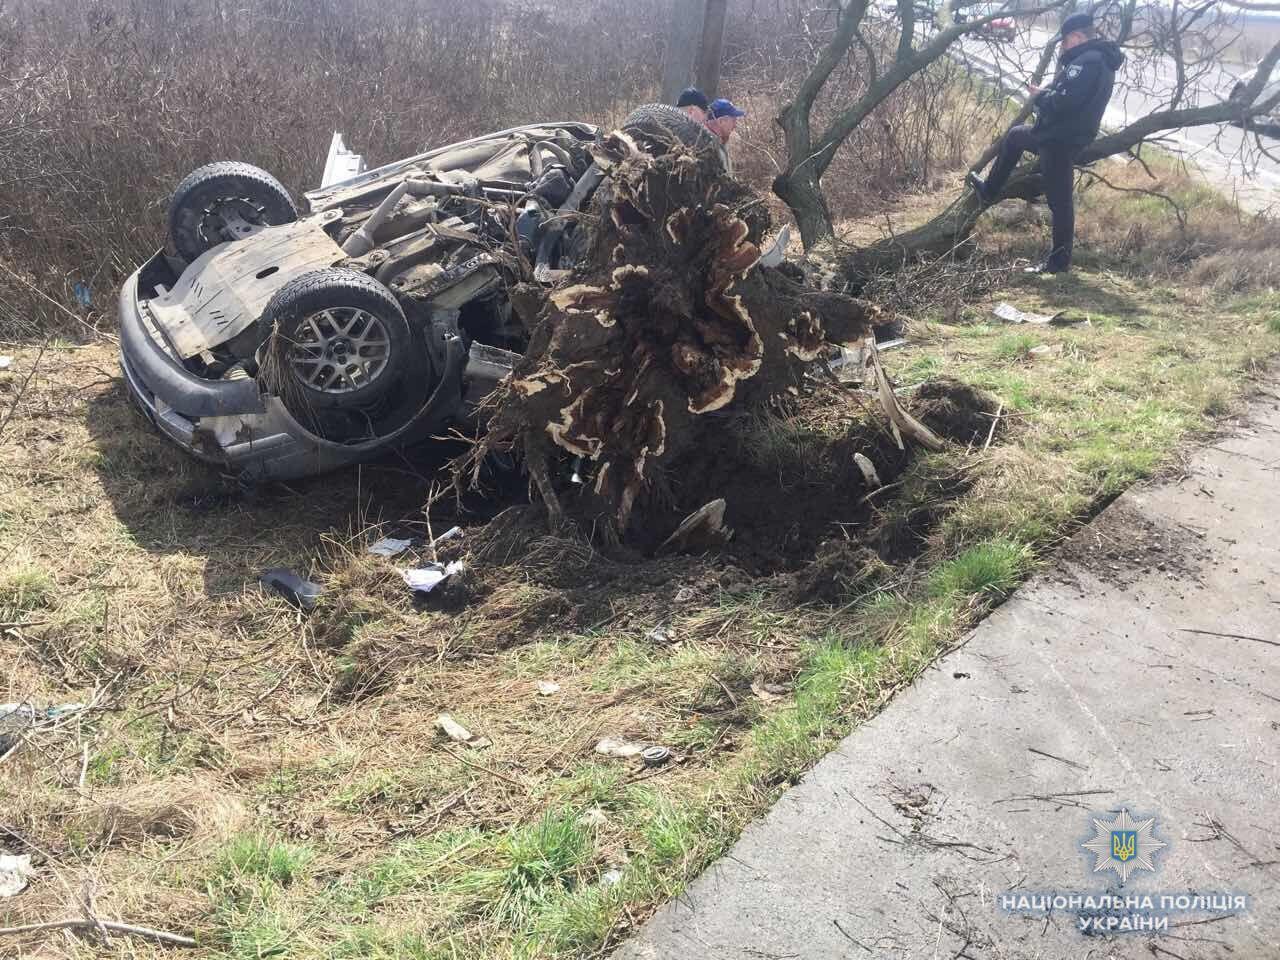 Купа металу і жертви: топ ДТП в Україні за добу